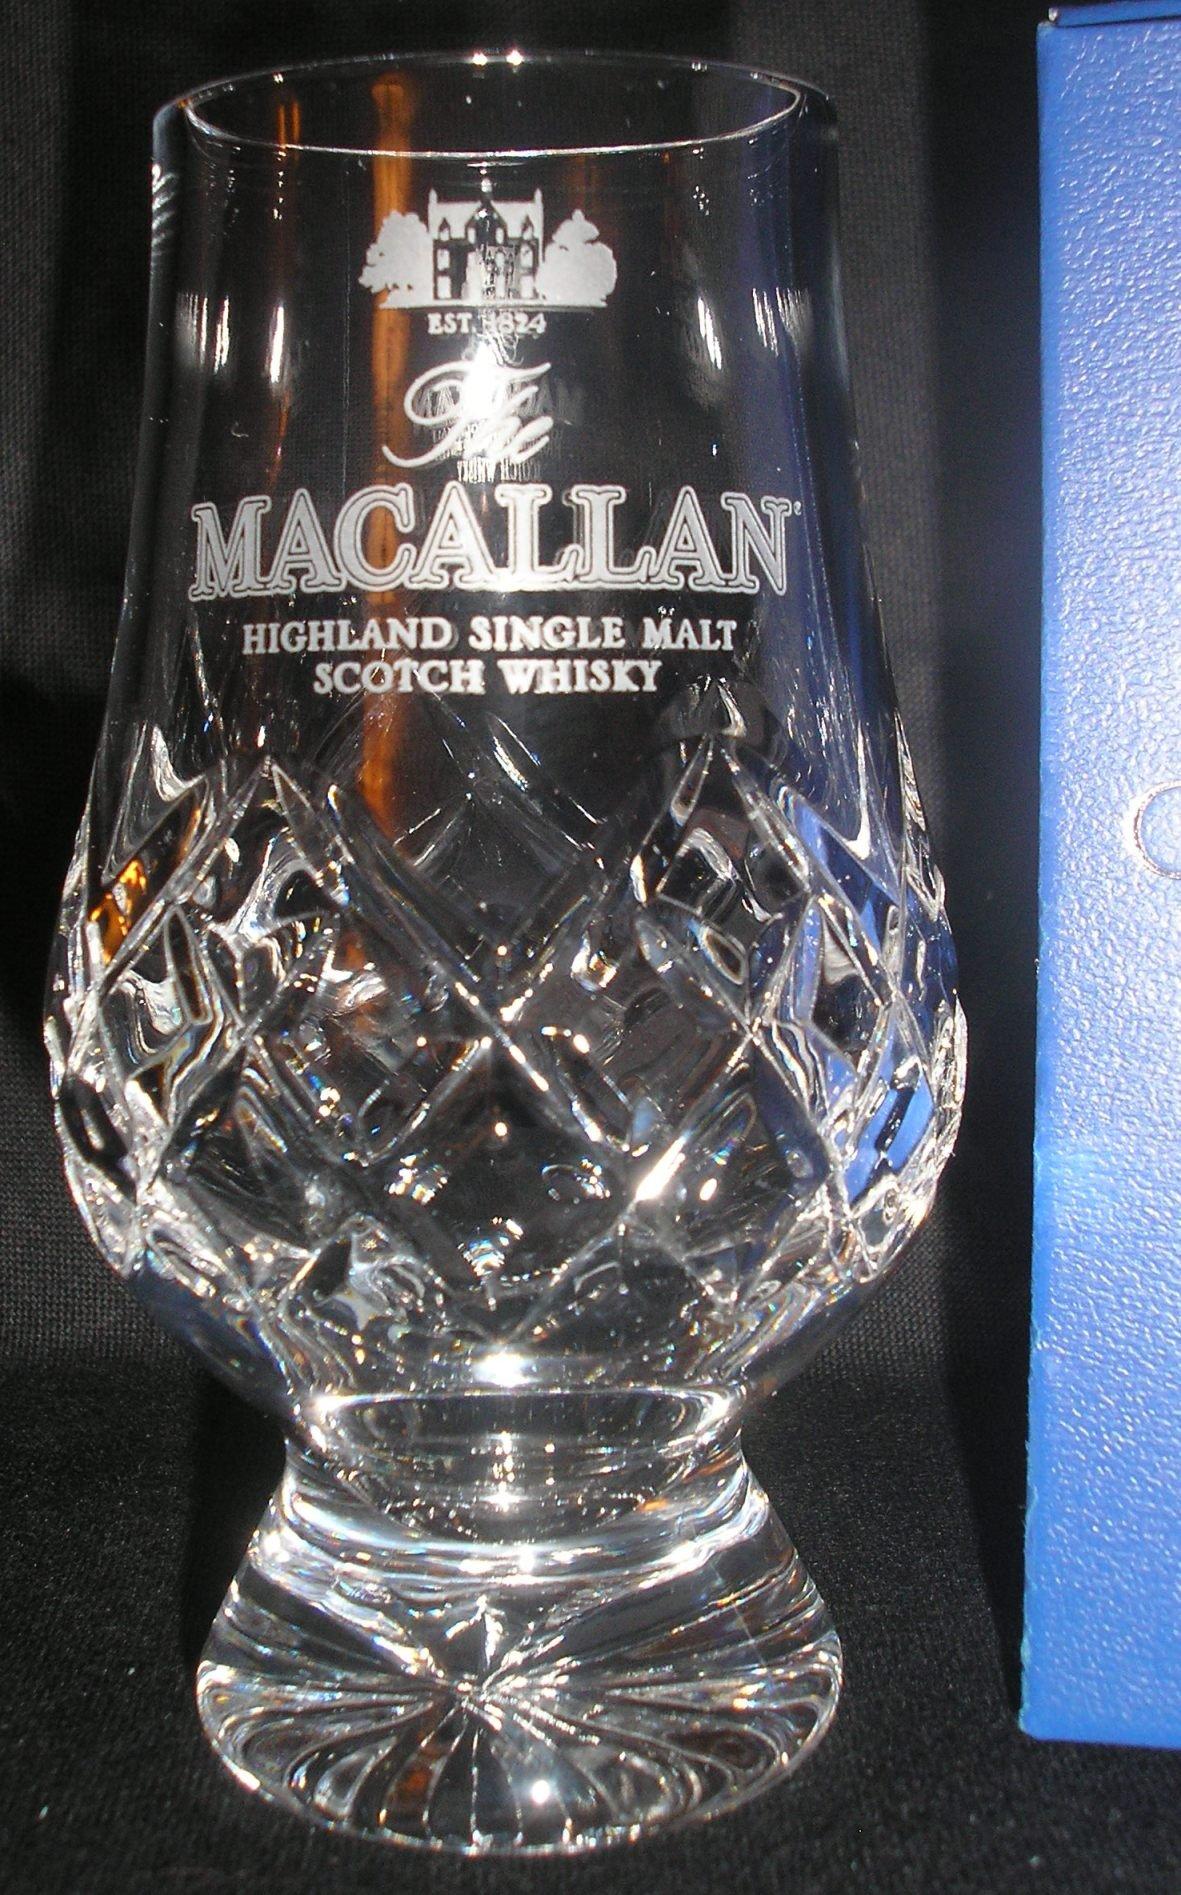 THE MACALLAN OFFICIAL GLENCAIRN CUT CRYSTAL SCOTCH MALT WHISKY TASTING GLASS